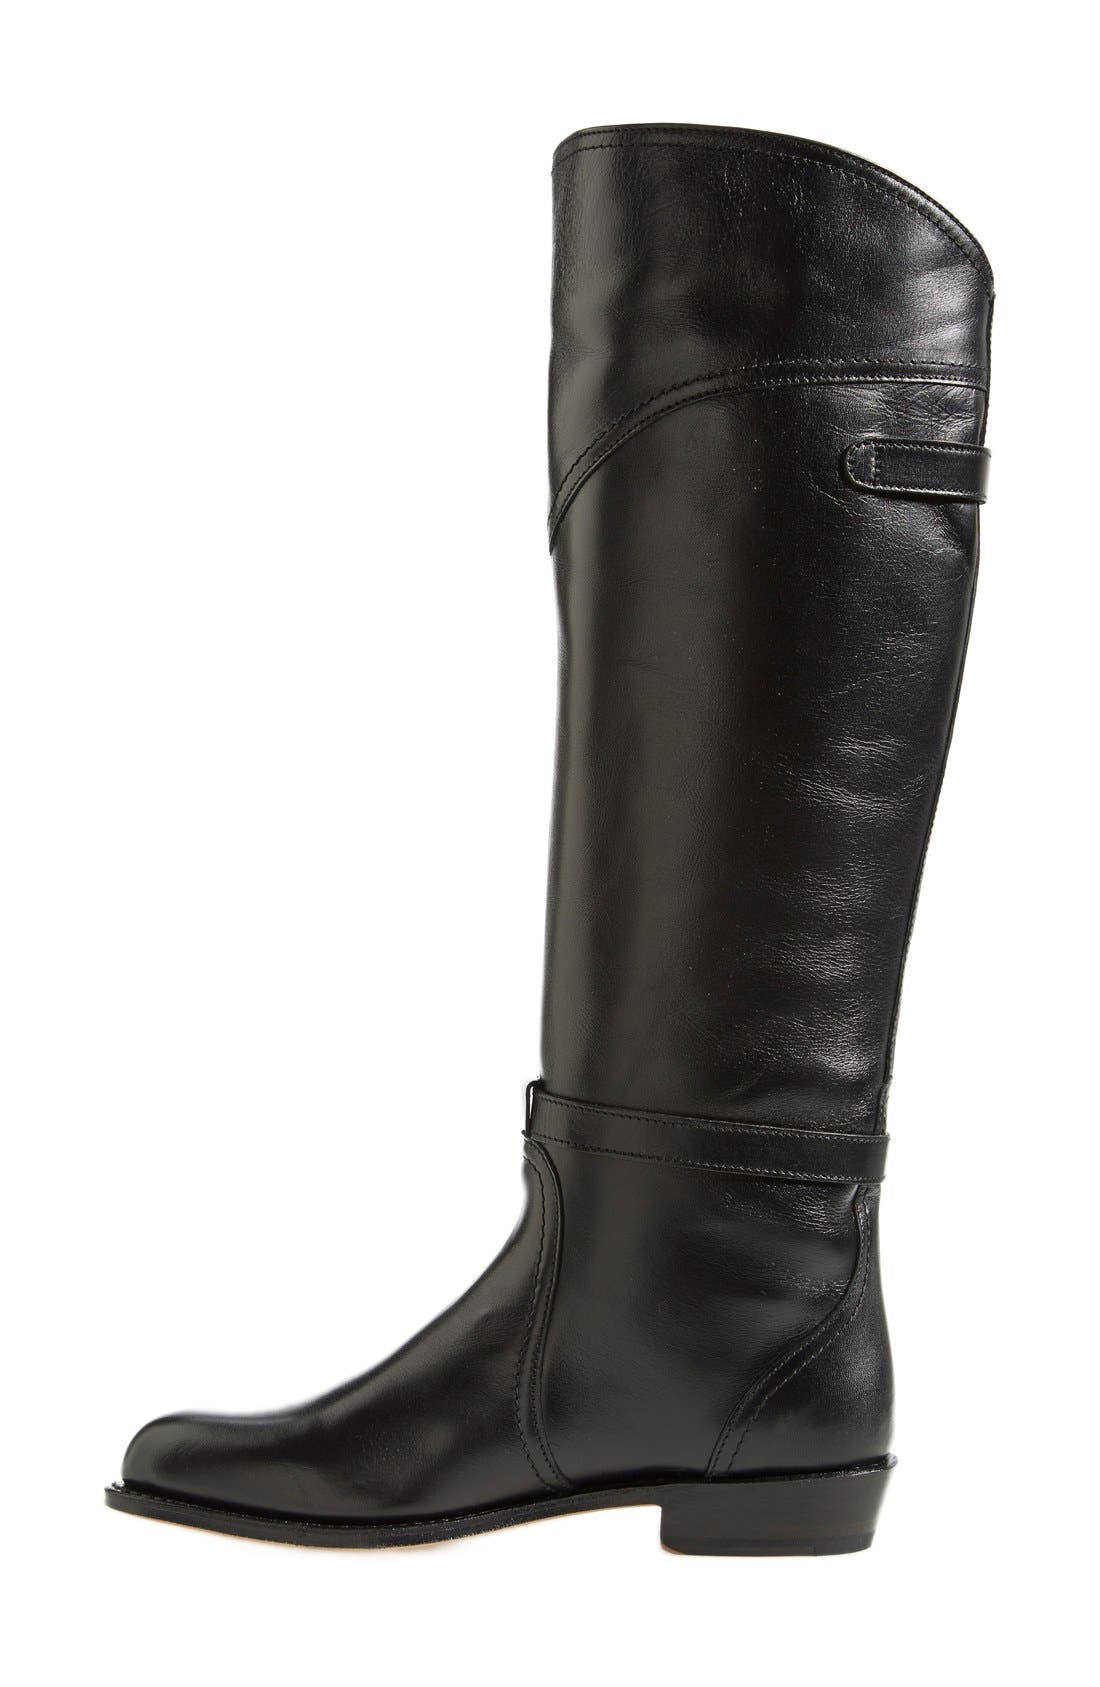 Alternate Image 2  - Frye 'Dorado' Leather Riding Boot